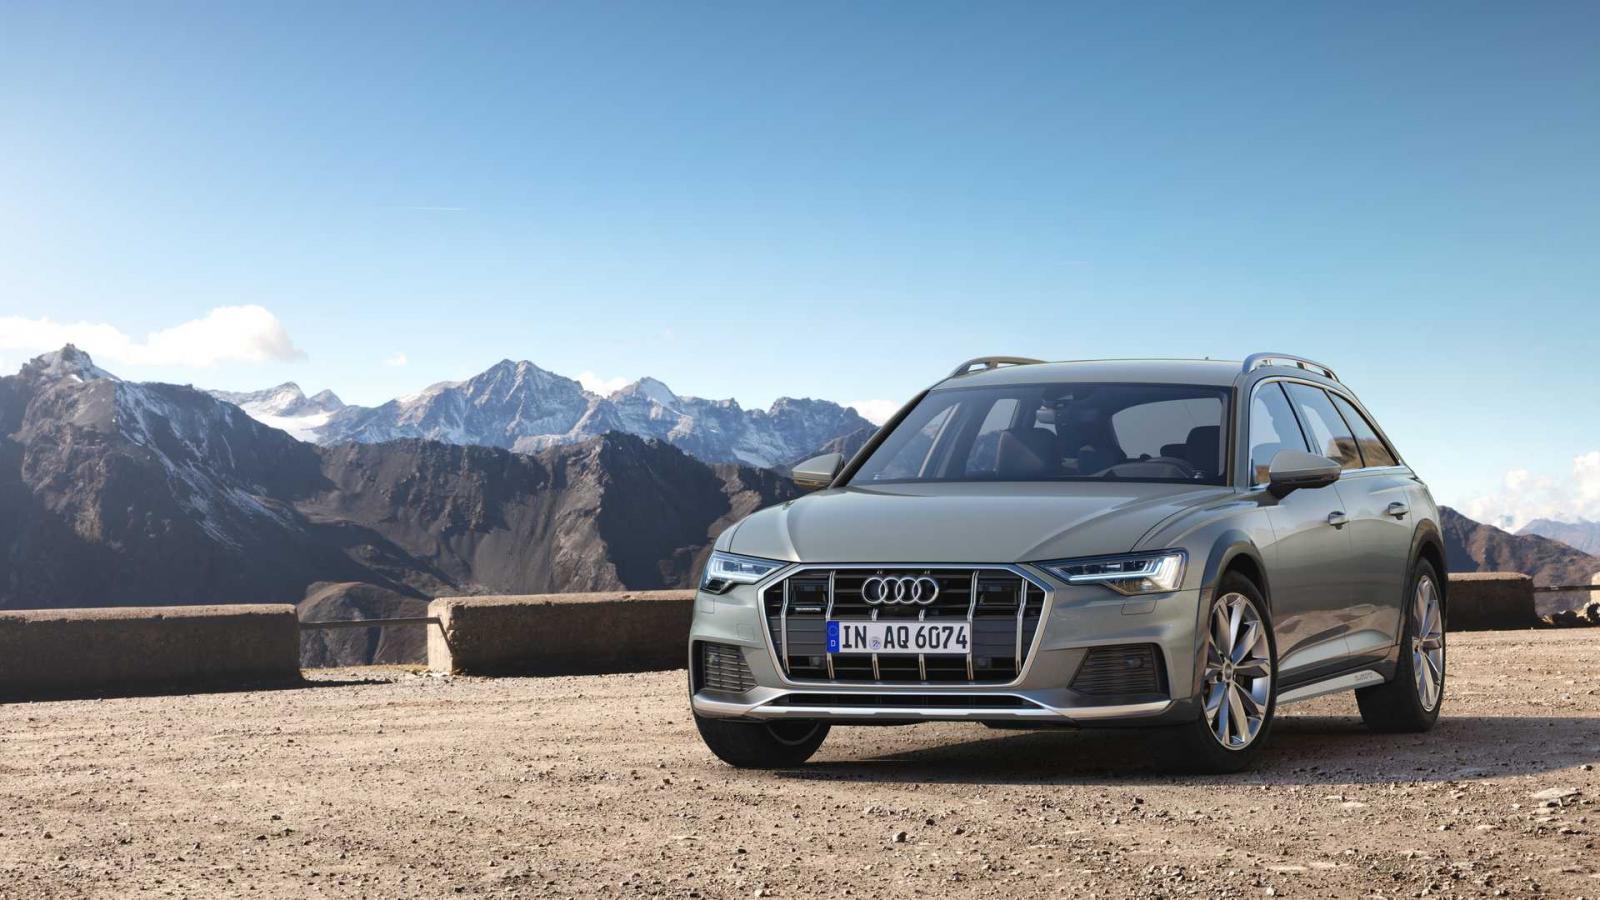 Audi จะเริ่มจำหน่าย A6 Allroad ตั้งแต่เดือนนี้แต่จำกัดแค่บางภูมิภาค โดยราคาเริ่มต้นในเยอรมนีอยู่ที่ 61,500 ยูโร โดยประมาณ